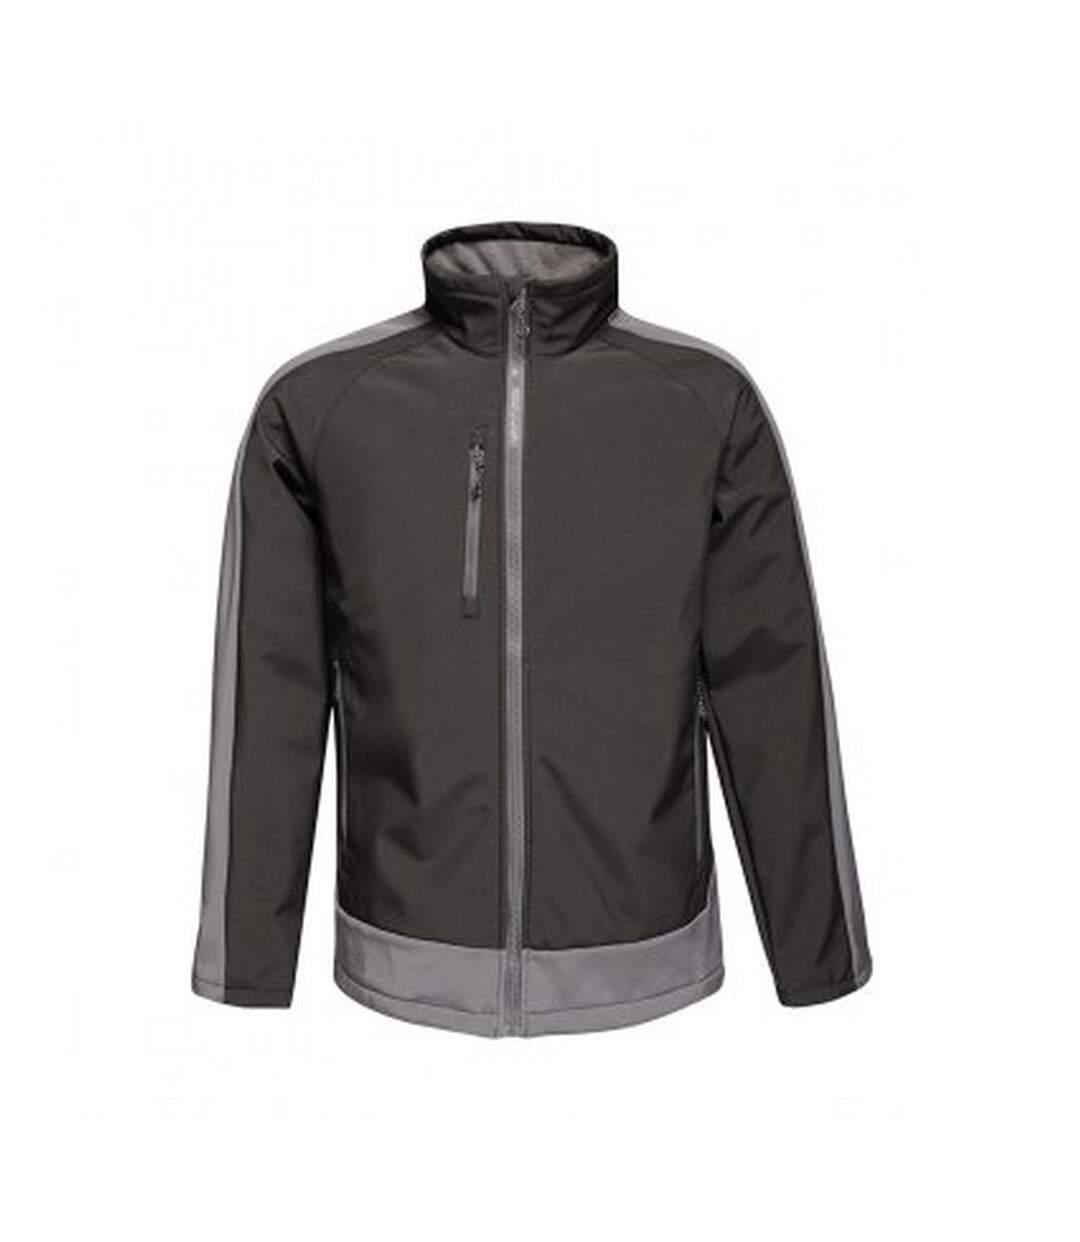 Regatta - Veste Softshell Contrast - Homme (Noir / gris) - UTPC3318